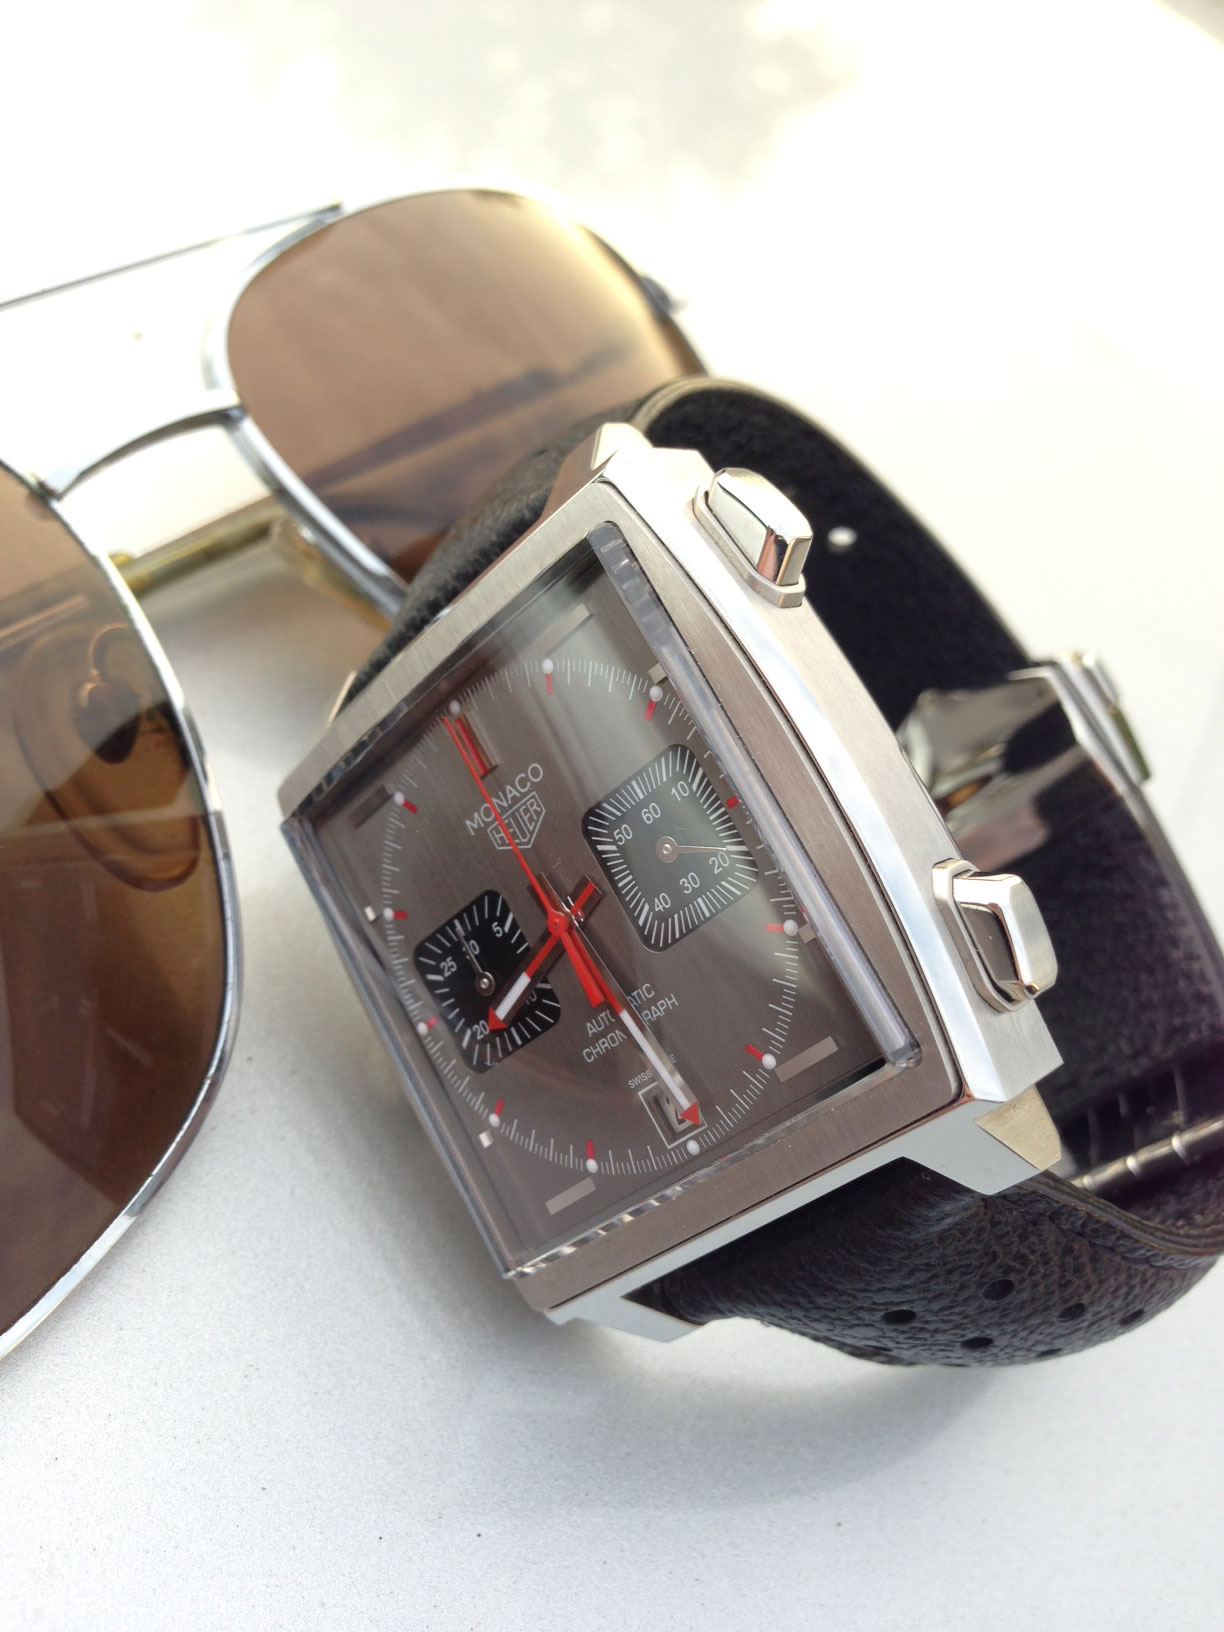 Heuer Monaco Vintage Chronographe montre de luxe d'occasion cresus